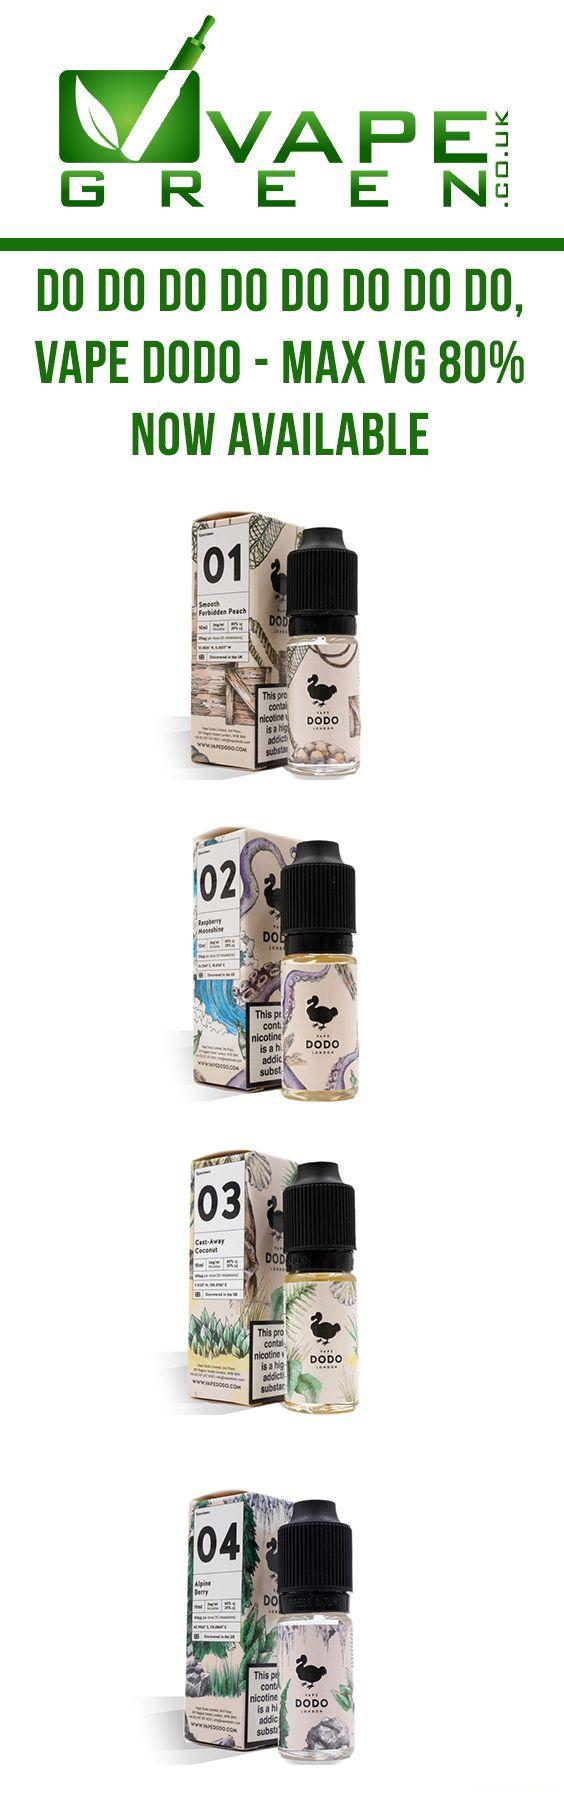 MAX VG E-Liquid from Vape Dodo now available :)   #vape #vaping #eliquid #ejuice #eliquid #vapeuk #vapefam #vapedodo #maxvg #highvg #ecig #ukvapers